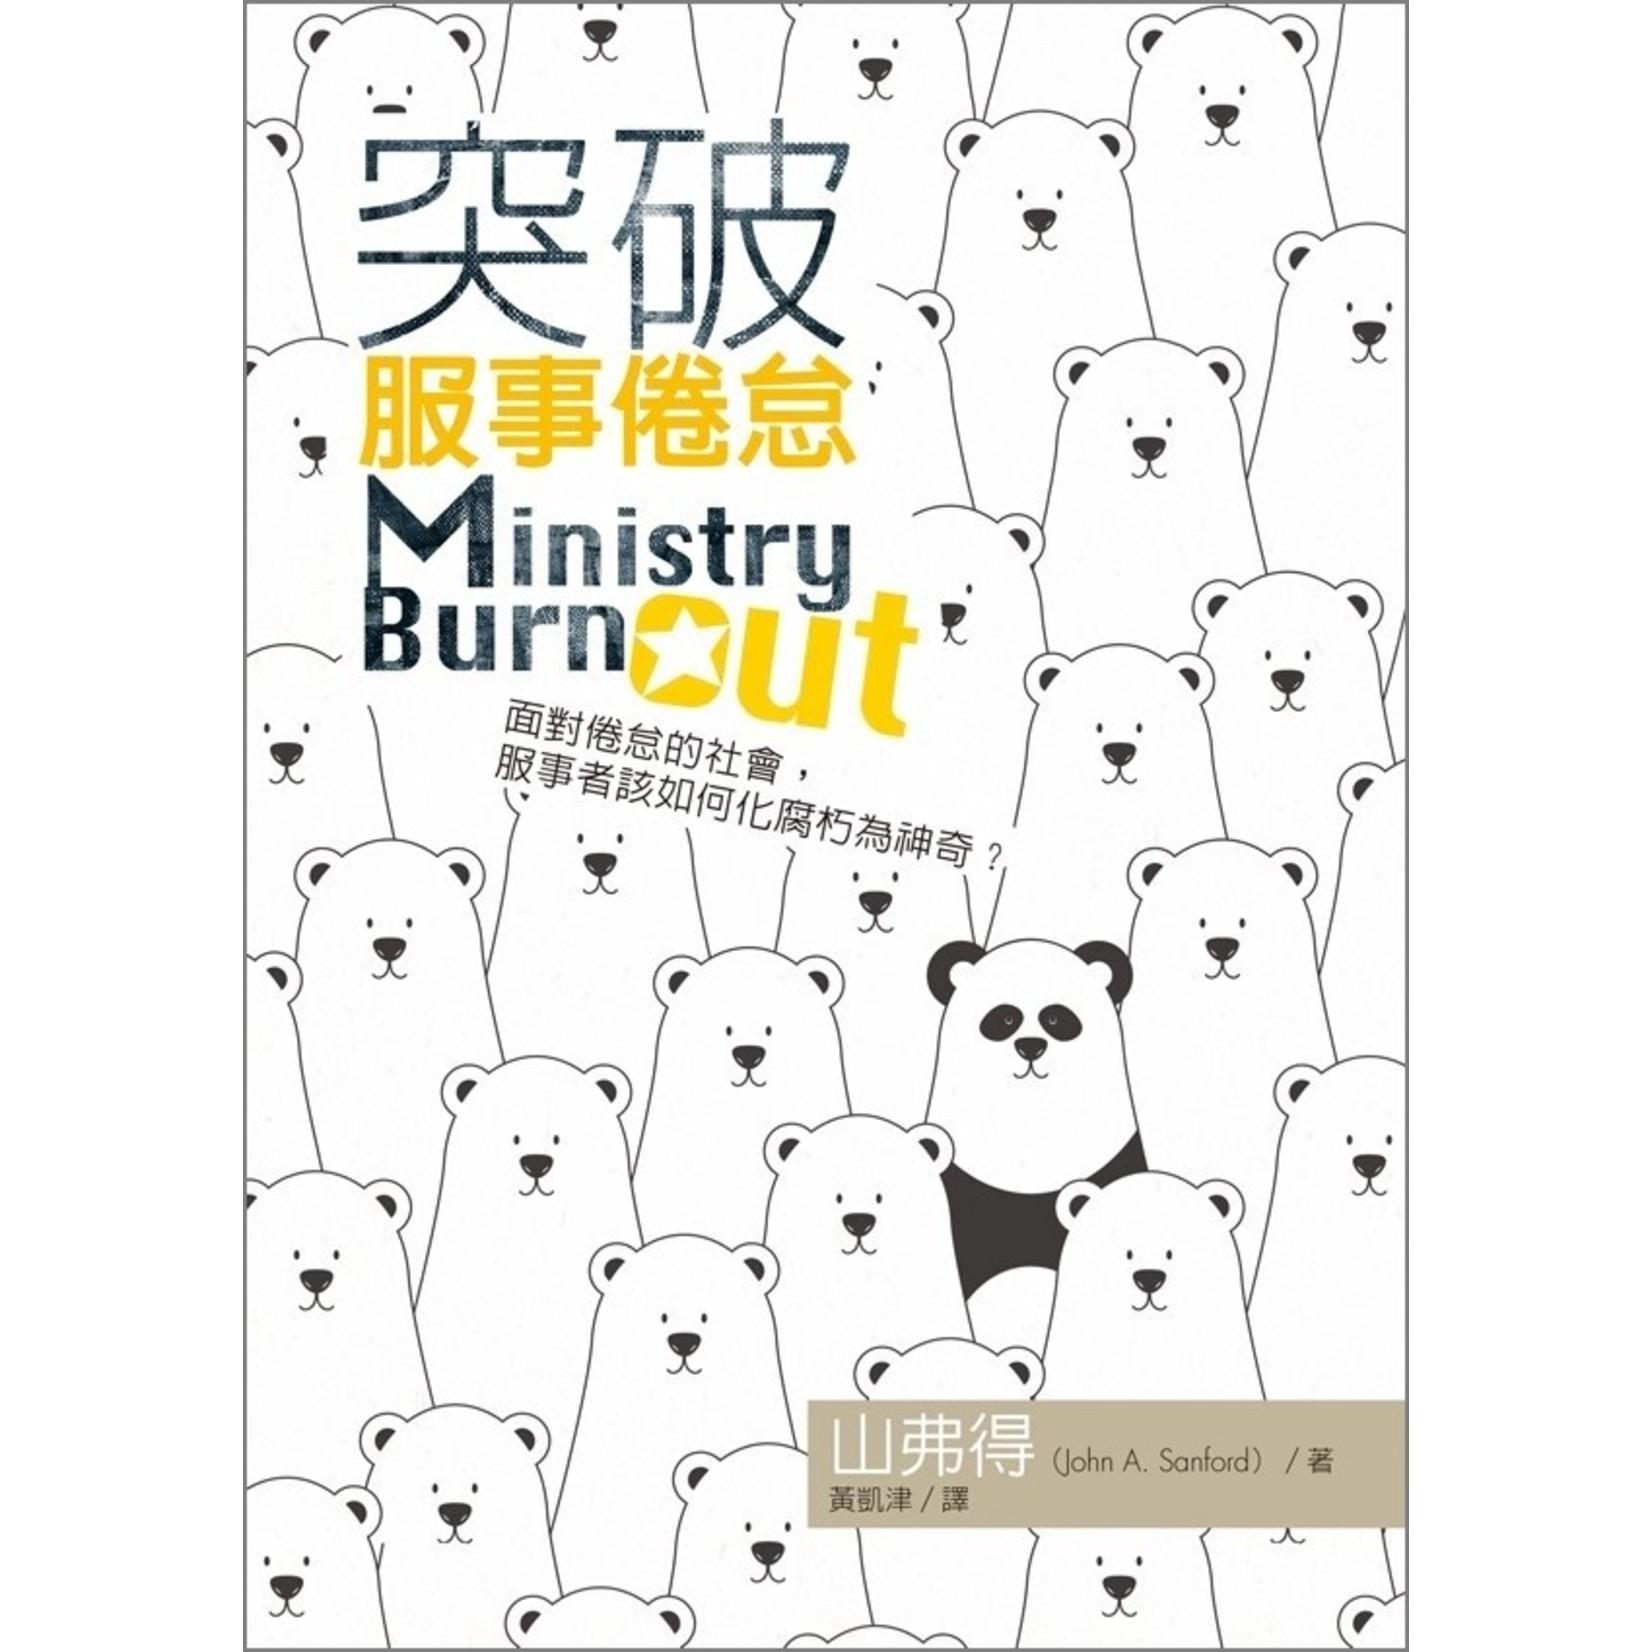 校園書房 Campus Books 突破服事倦怠 Ministry Burnout